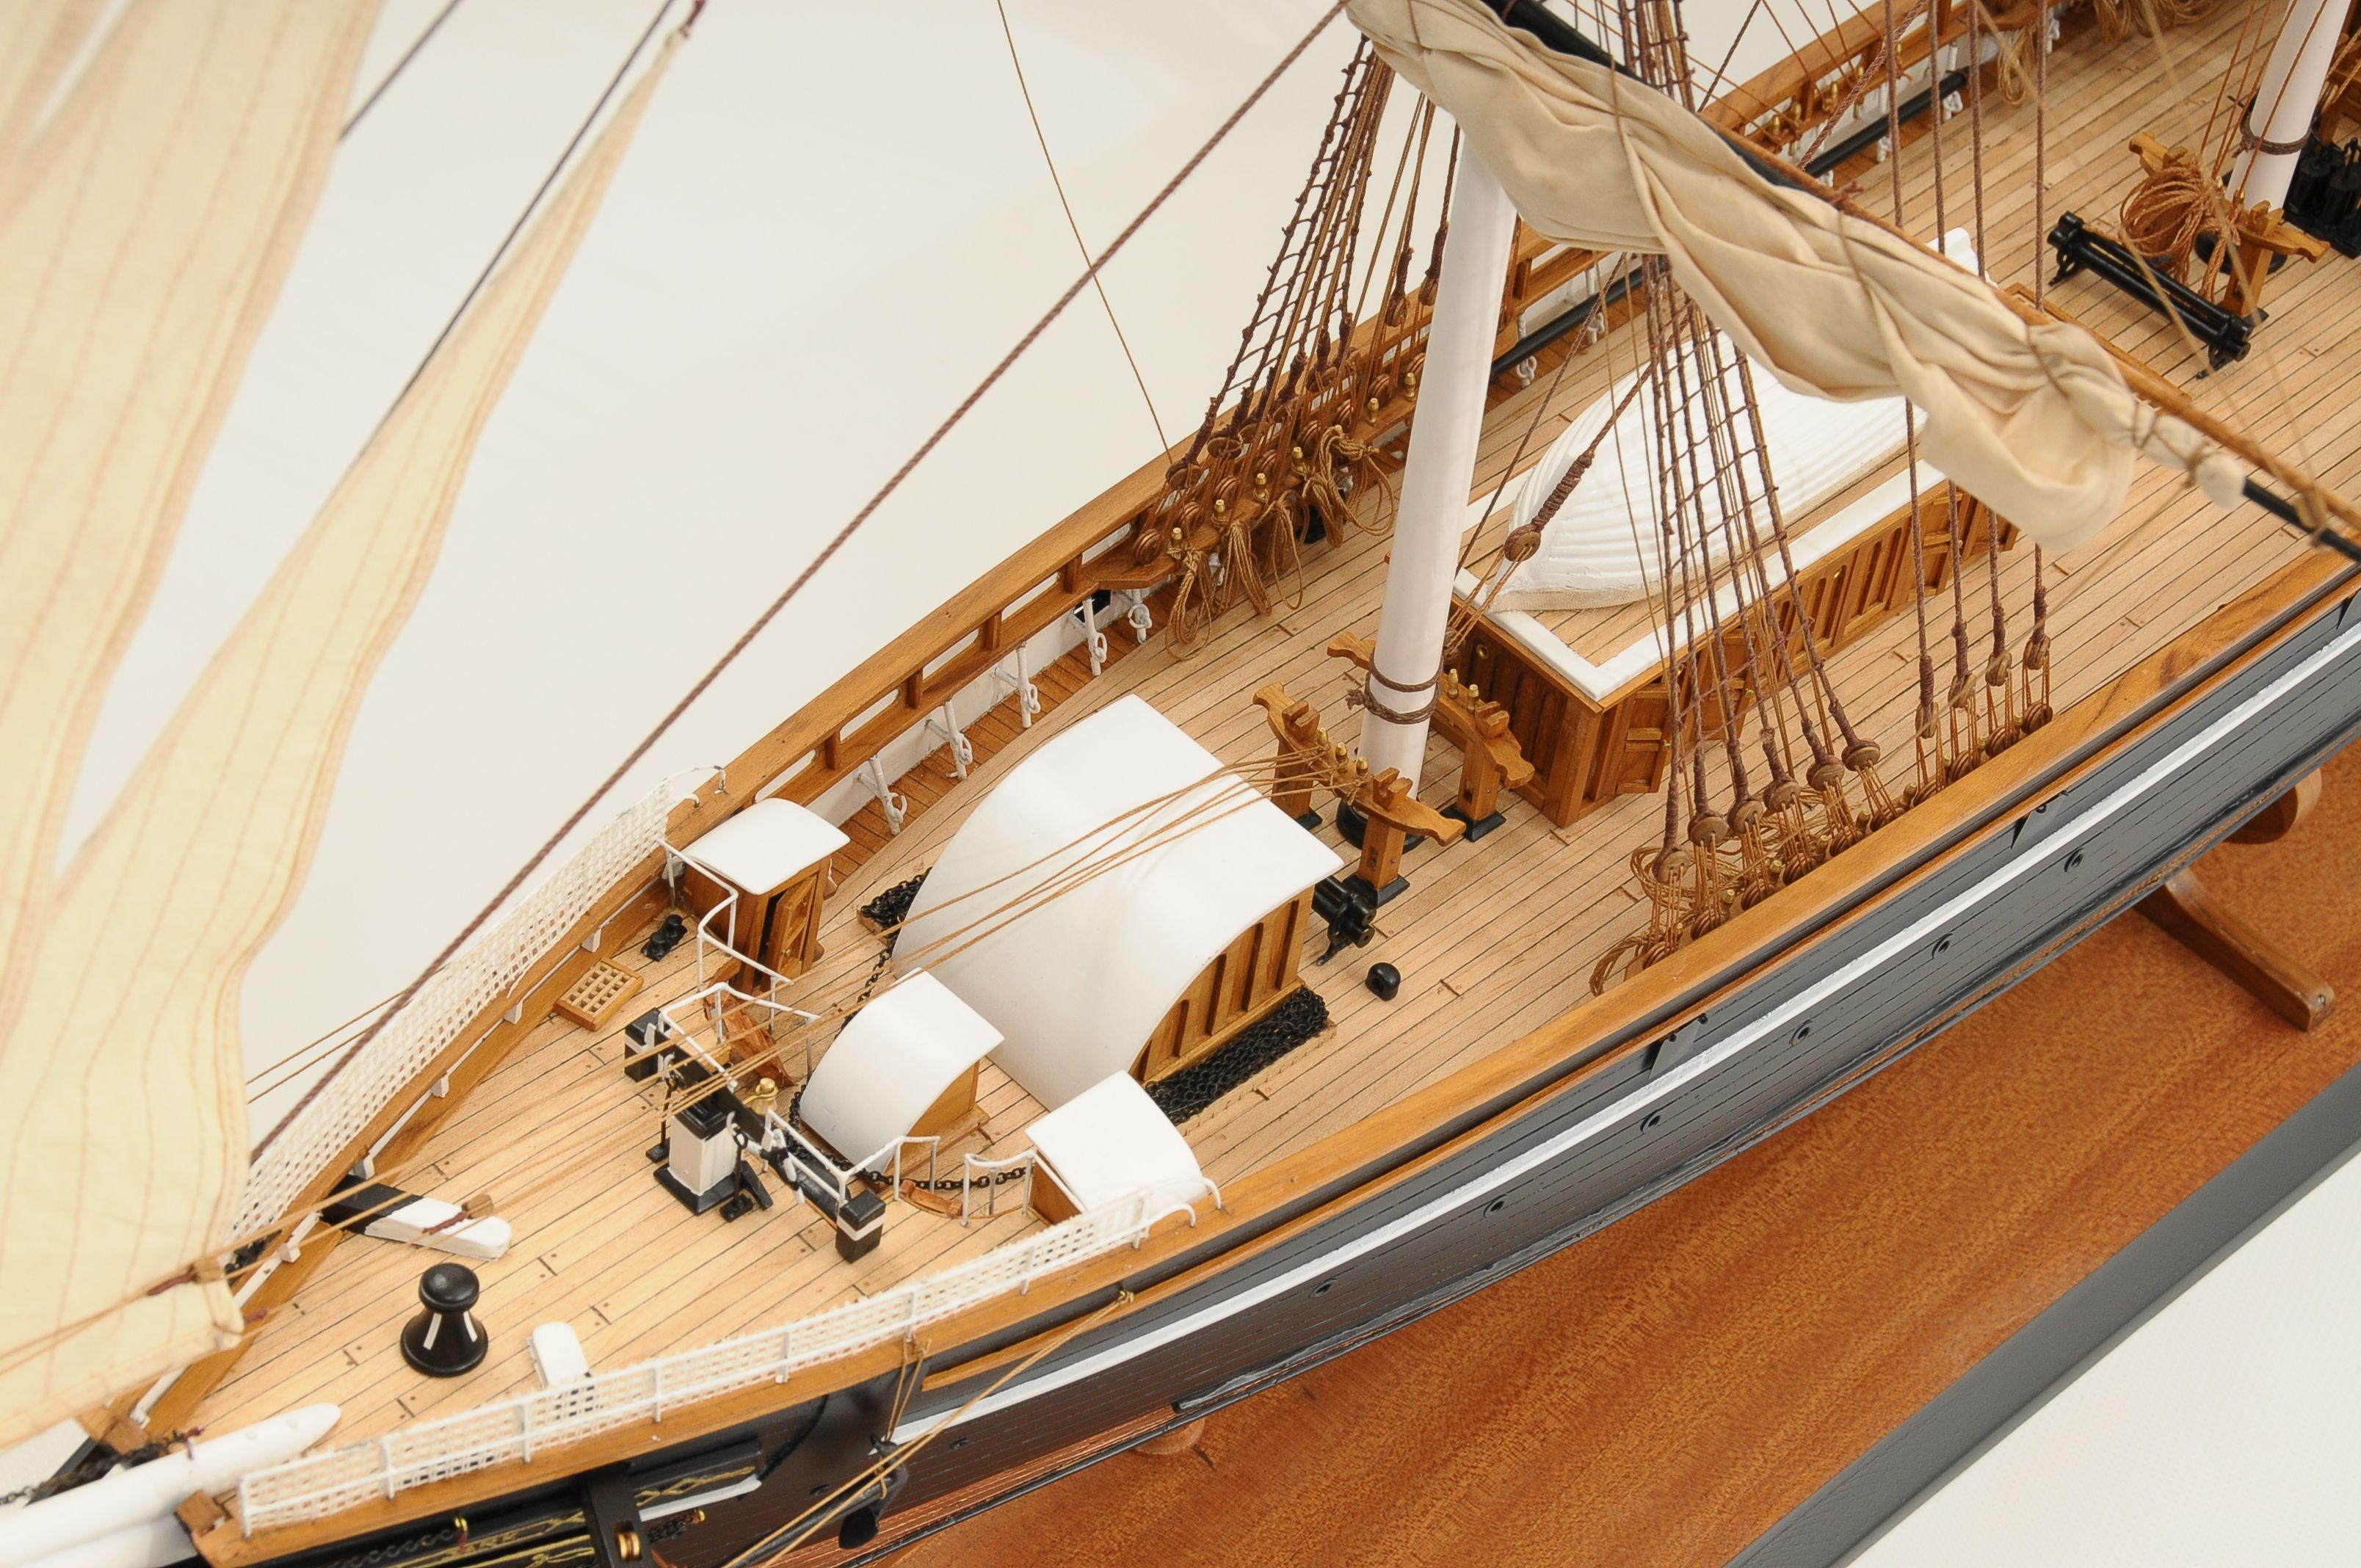 553-8668-Cutty-Sark-model-ship-Premier-Range